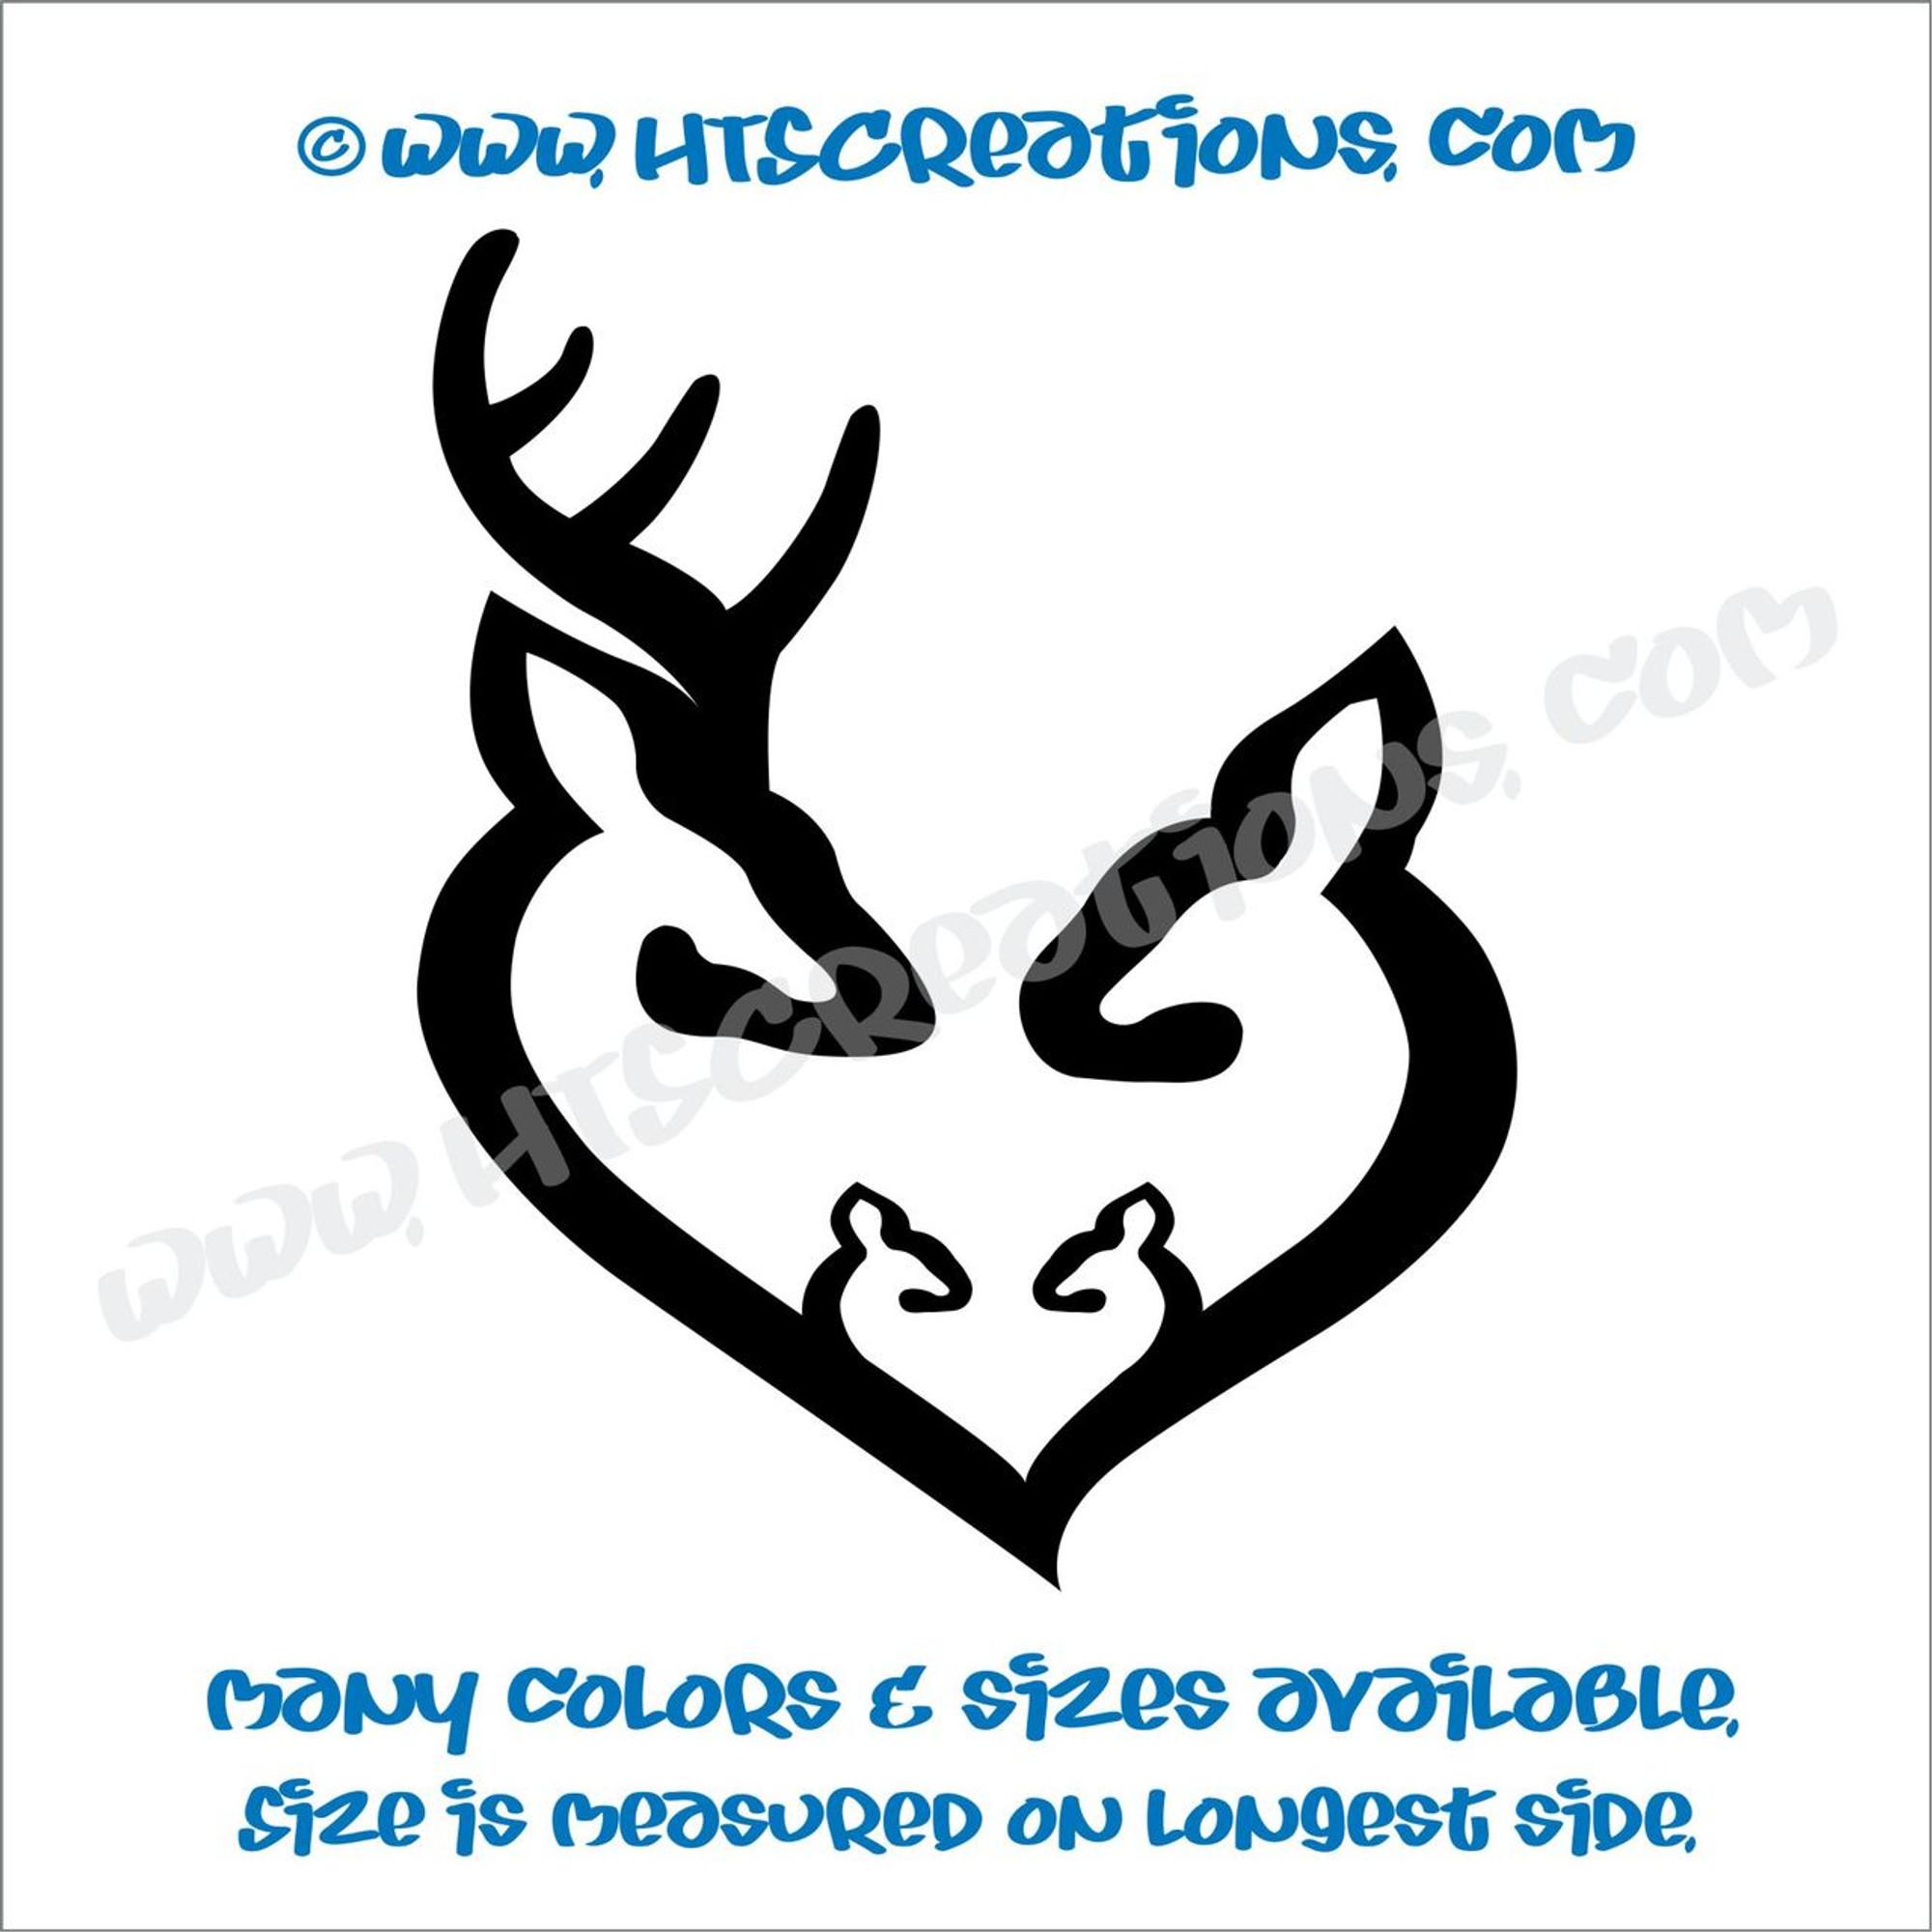 Deer Buck Doe Heart vinyl decal Hunting Fishing Game Car Boat ATV Truck